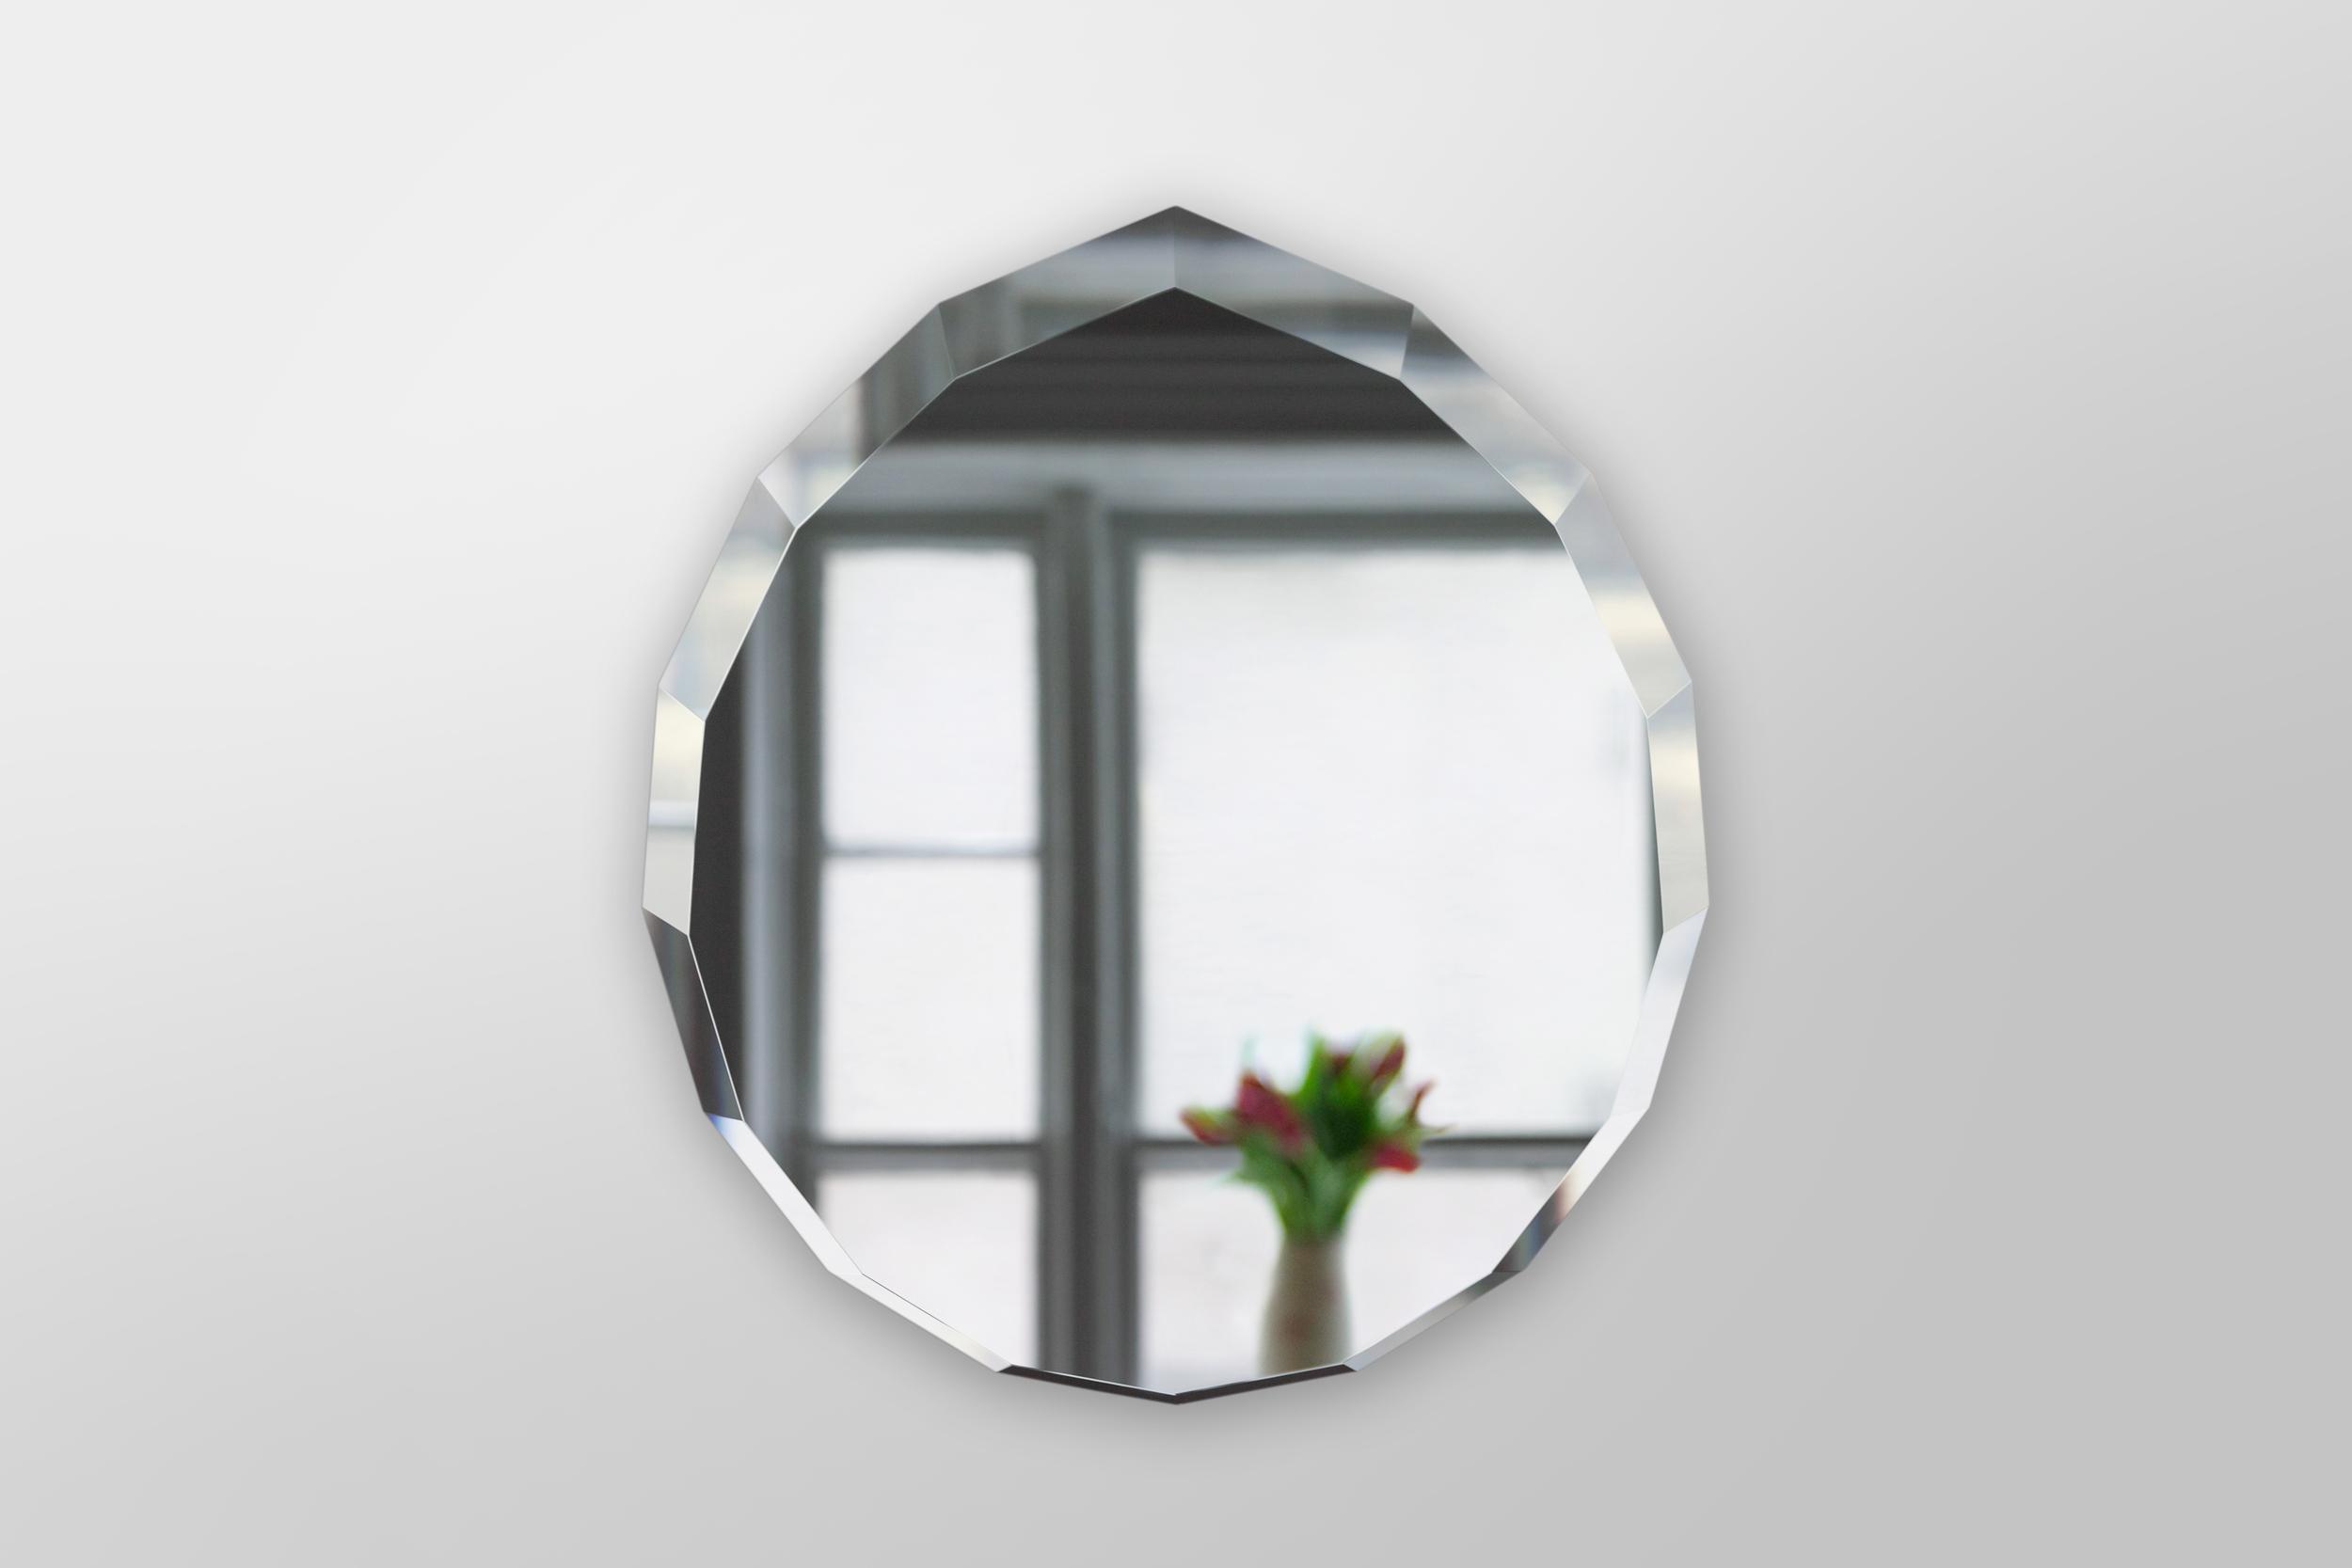 Diamond Mirror.  A Beveled Mirror Designed by Piet Houtenbos in Brooklyn, NY.